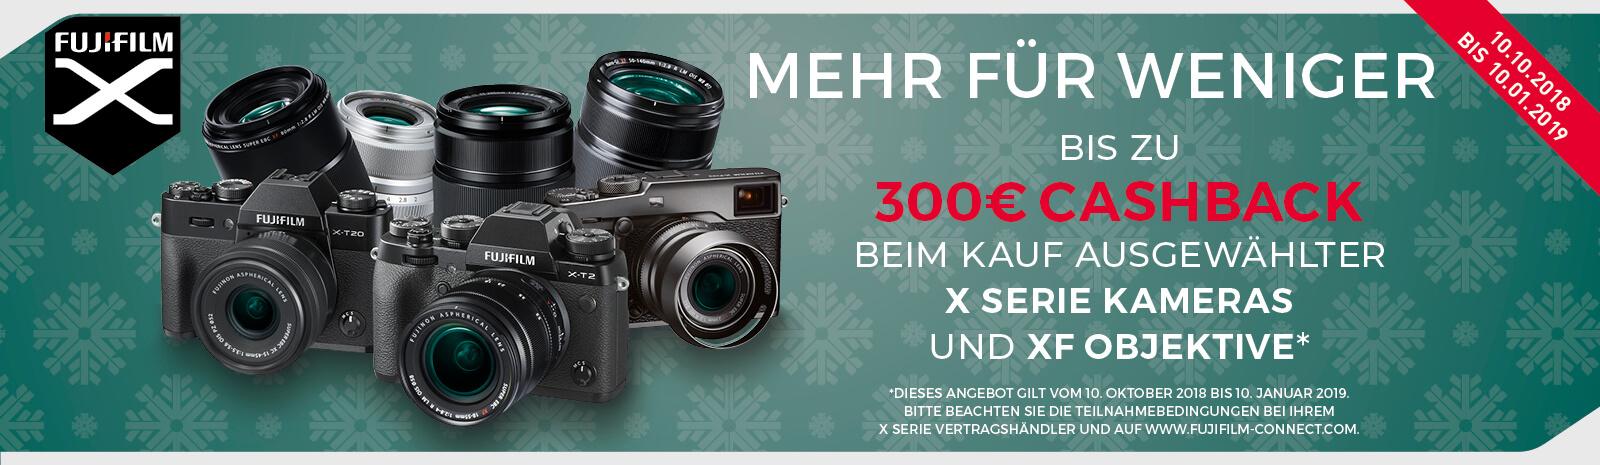 FujiFilm Winter Cashback bei Photo Universal Stuttgart